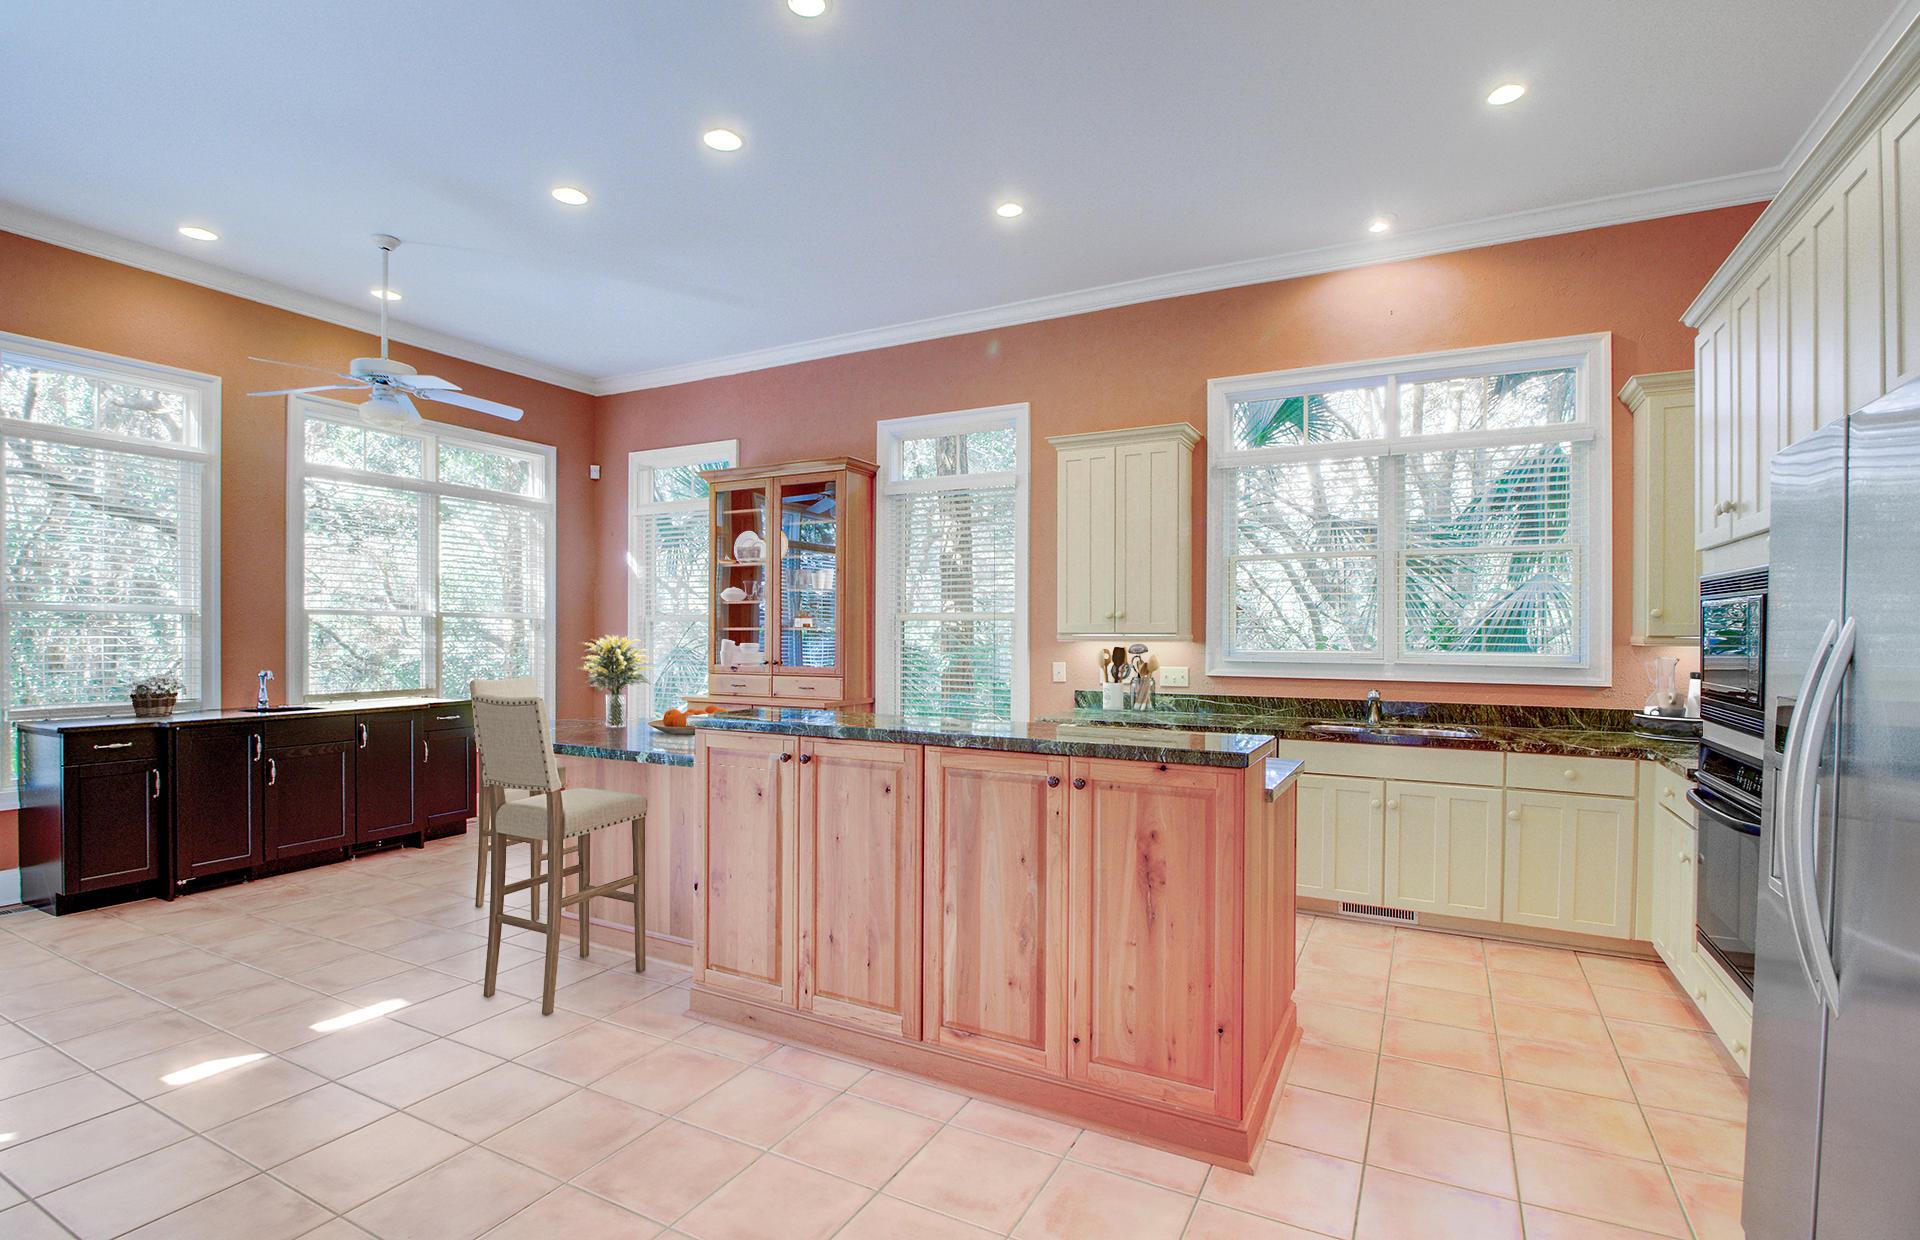 Kiawah Island Homes For Sale - 402 Ocean Oaks, Kiawah Island, SC - 42